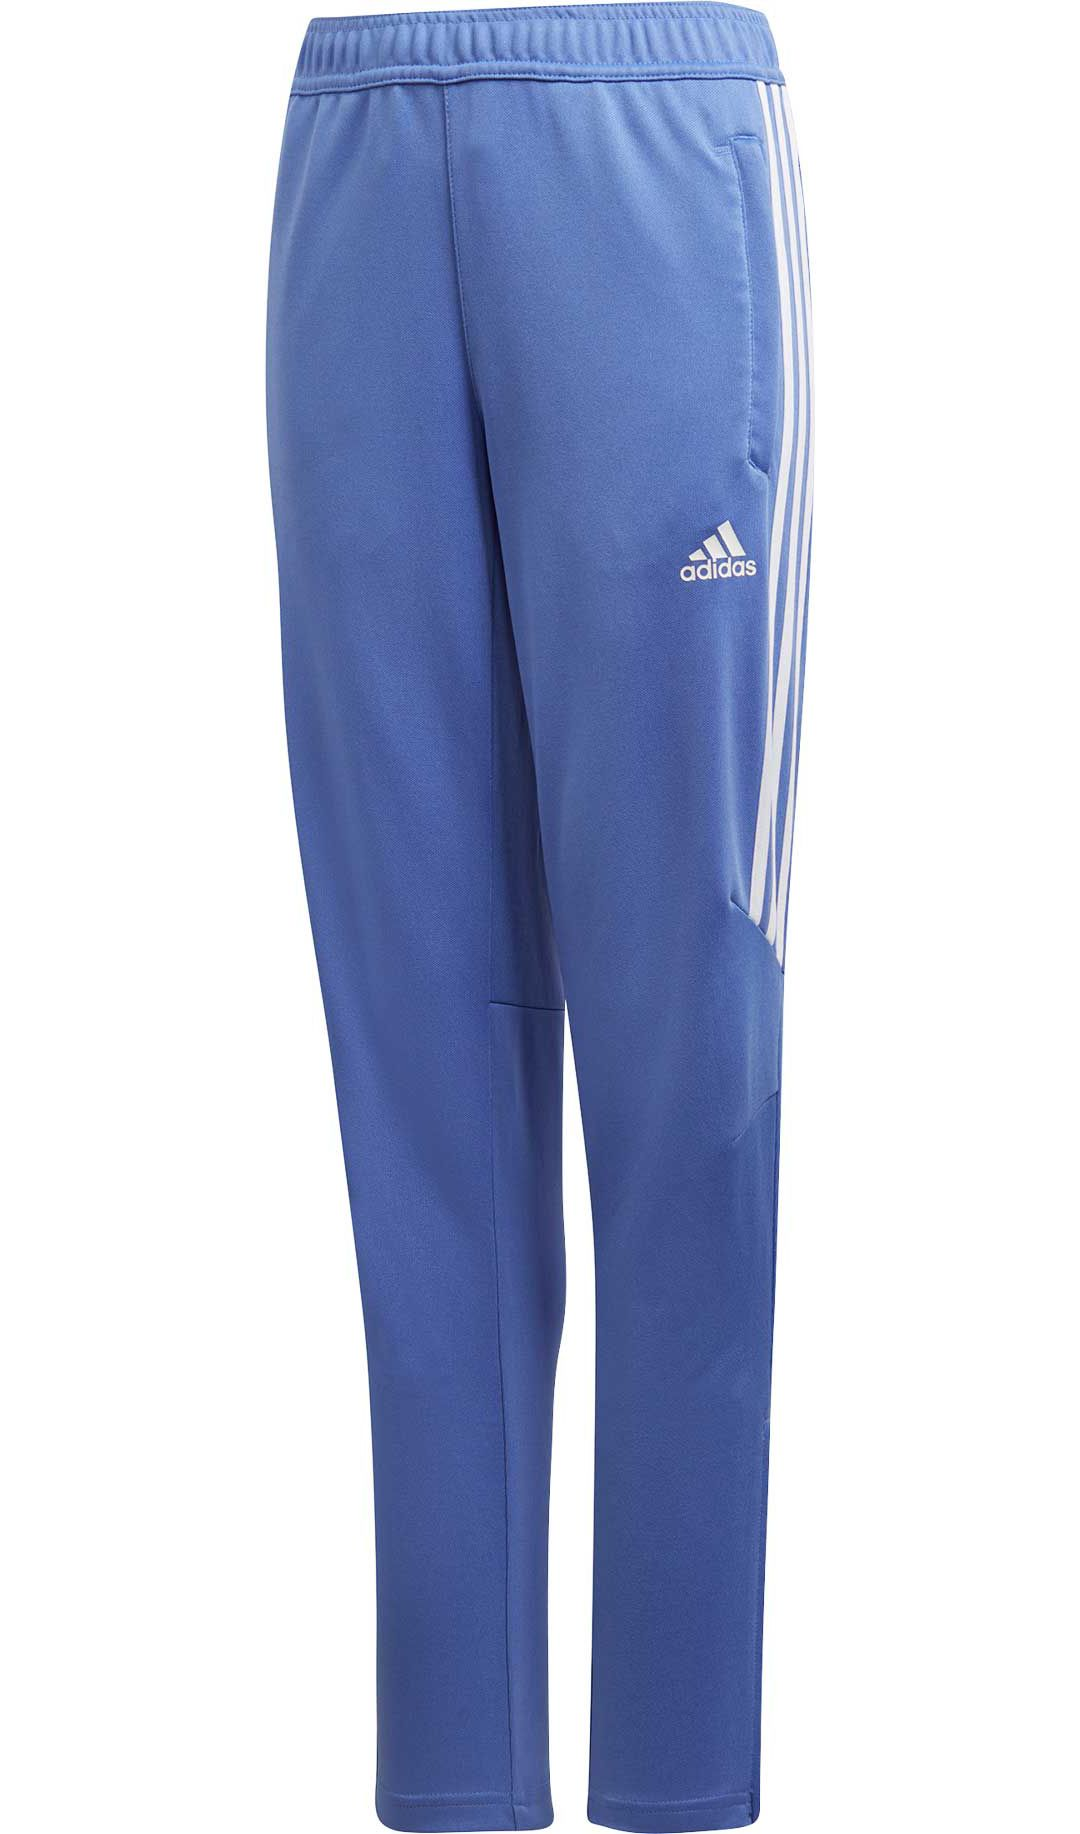 758aa664 adidas Youth Tiro 17 Soccer Training Pants | DICK'S Sporting Goods